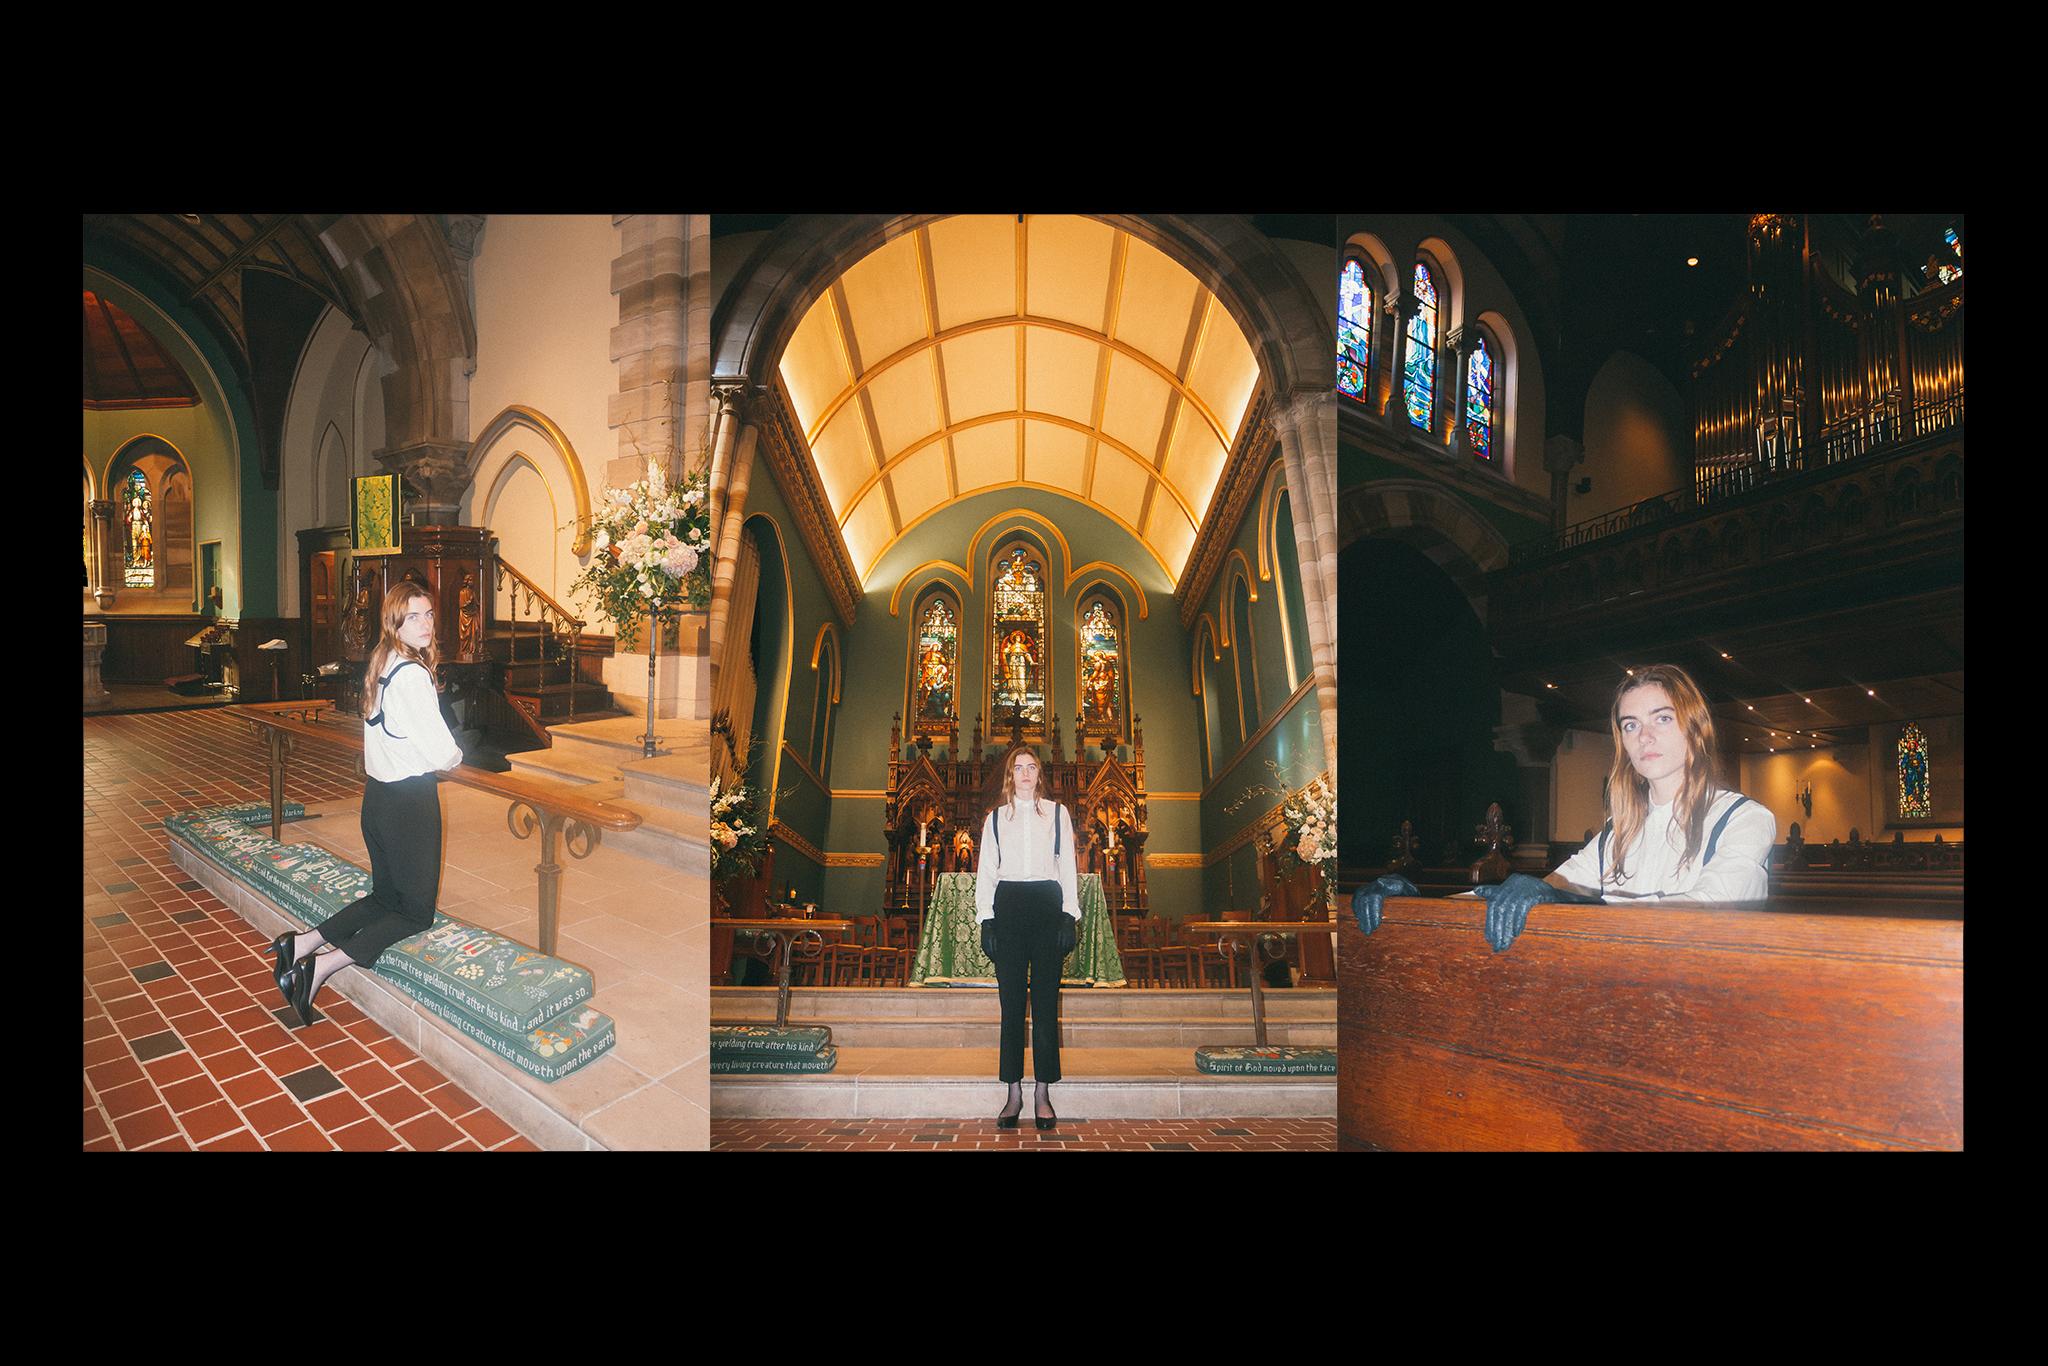 church 4.jpg